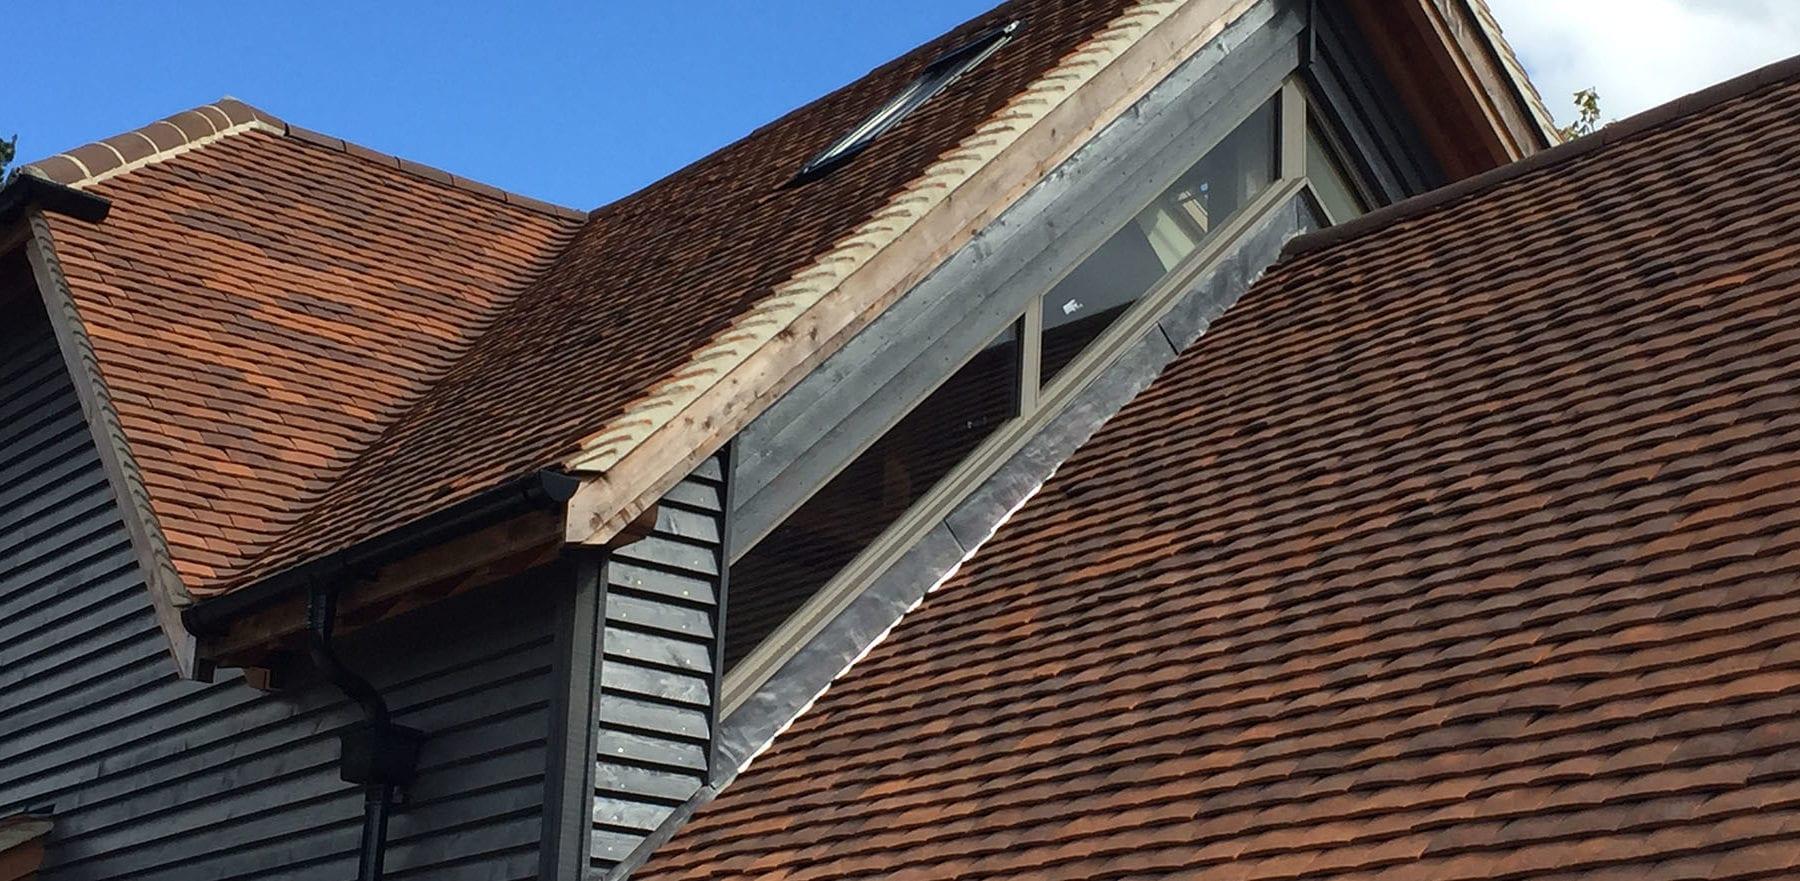 Lifestiles - Handmade Brown Clay Roof Tiles - Midgham, England 2